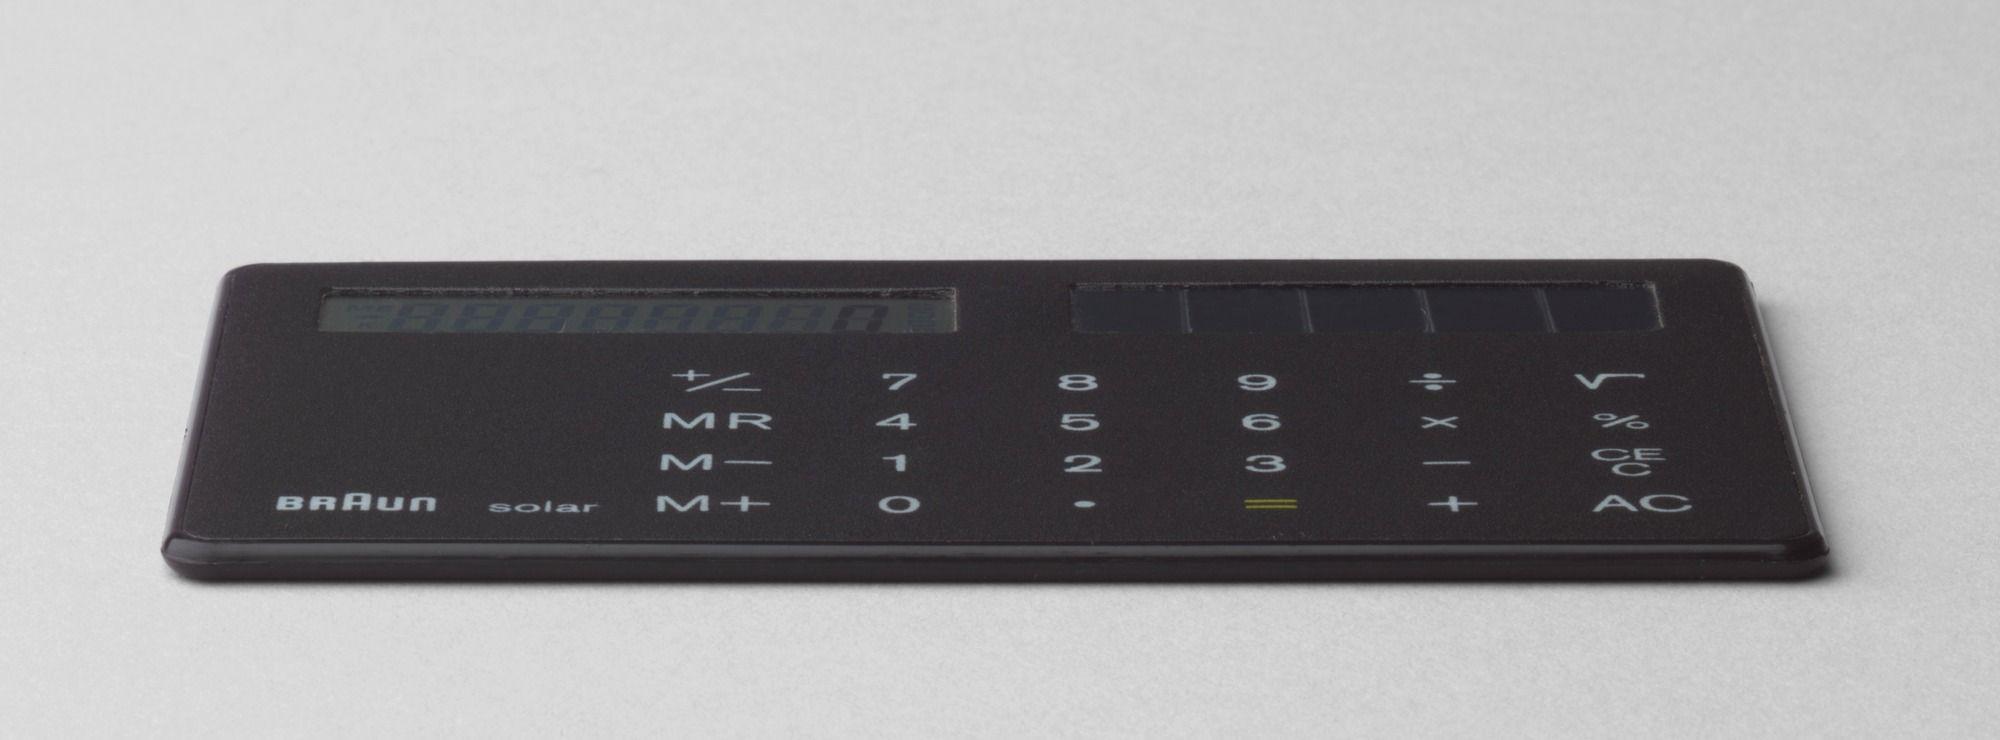 Dietrich lubs calculator 1986 braun ag frankfurt